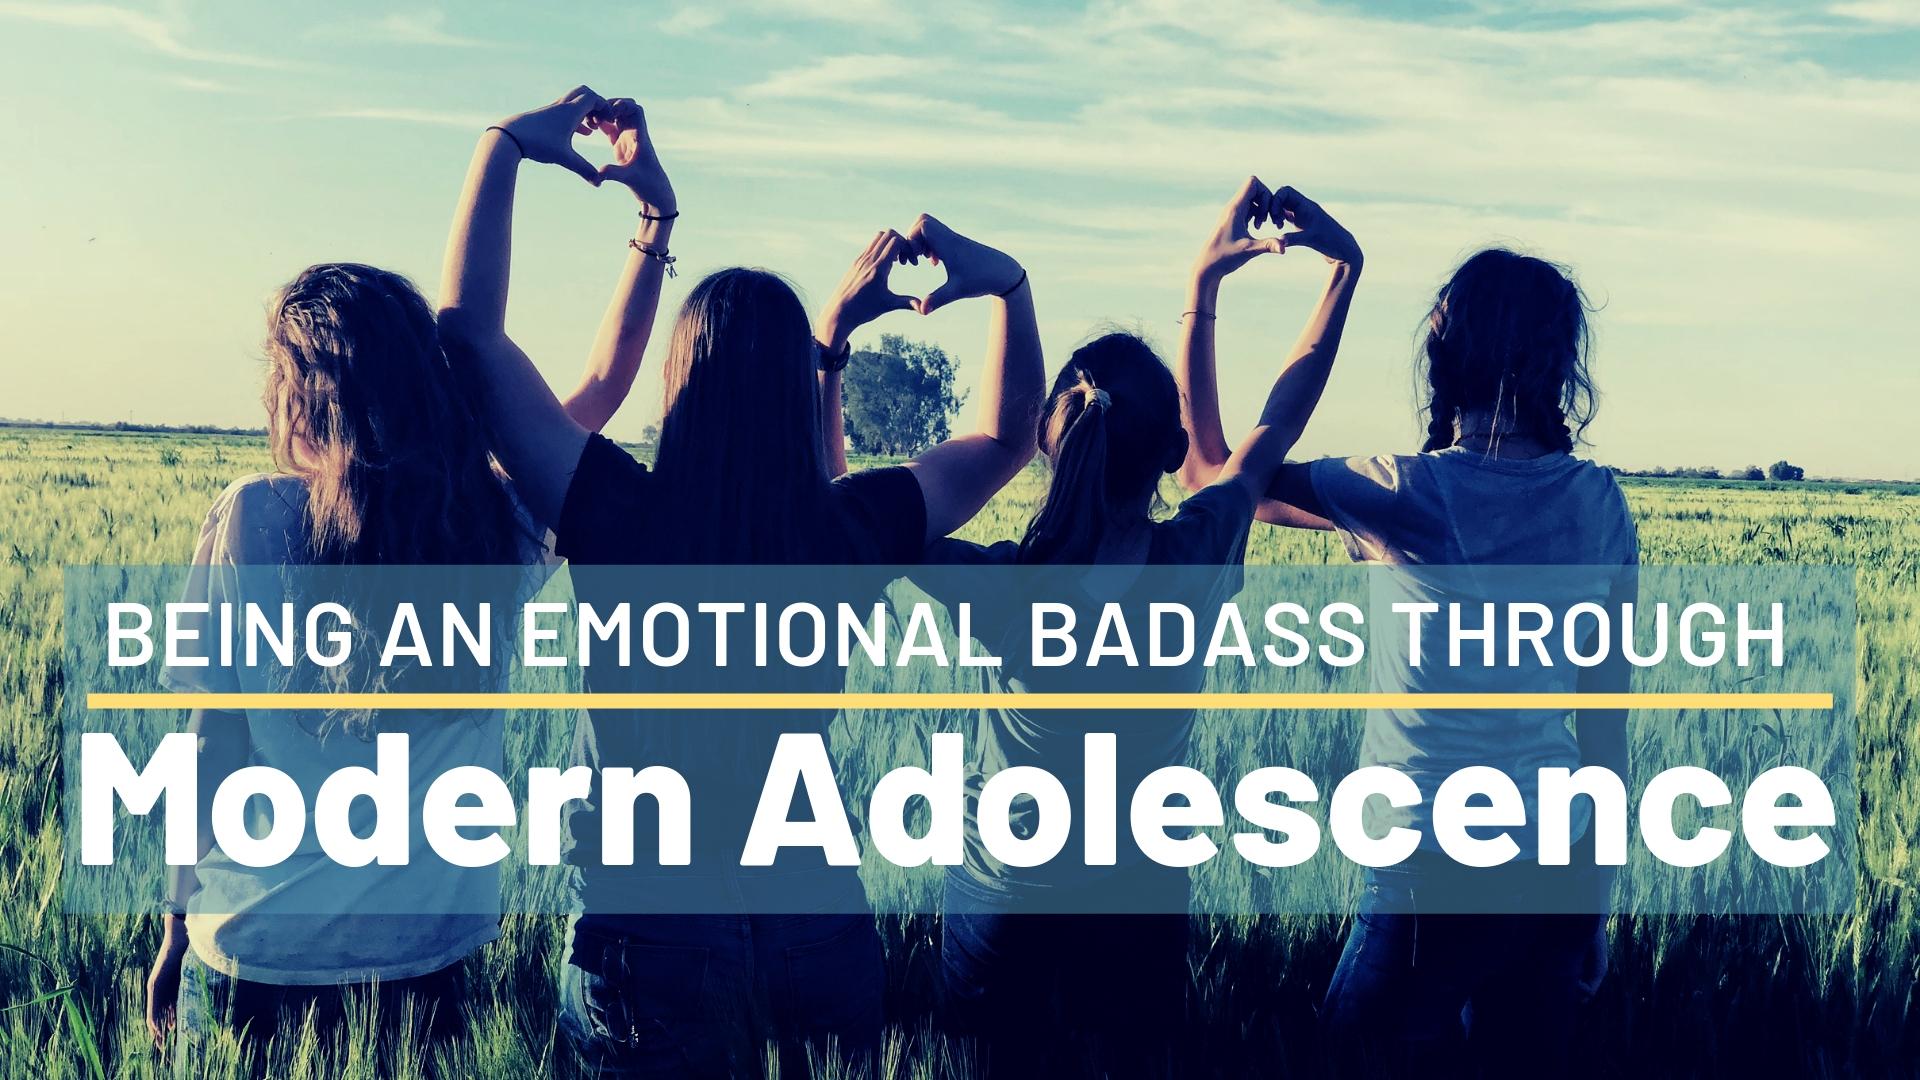 Modern Adolescence